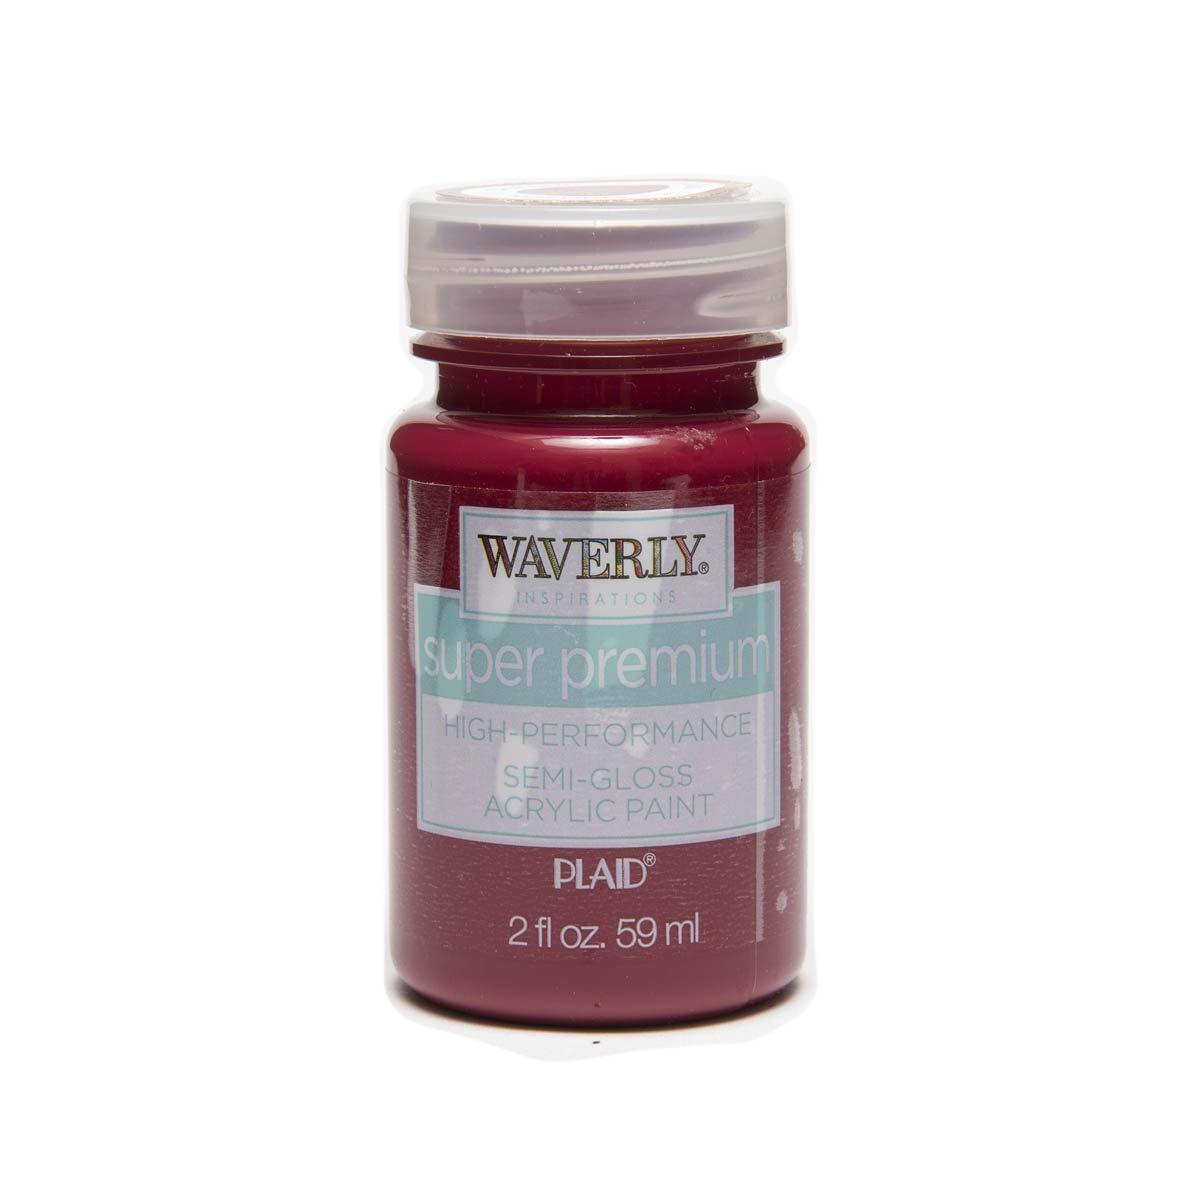 Waverly ® Inspirations Super Premium Semi-Gloss Acrylic Paint - Crimson, 2 oz. - 60611E